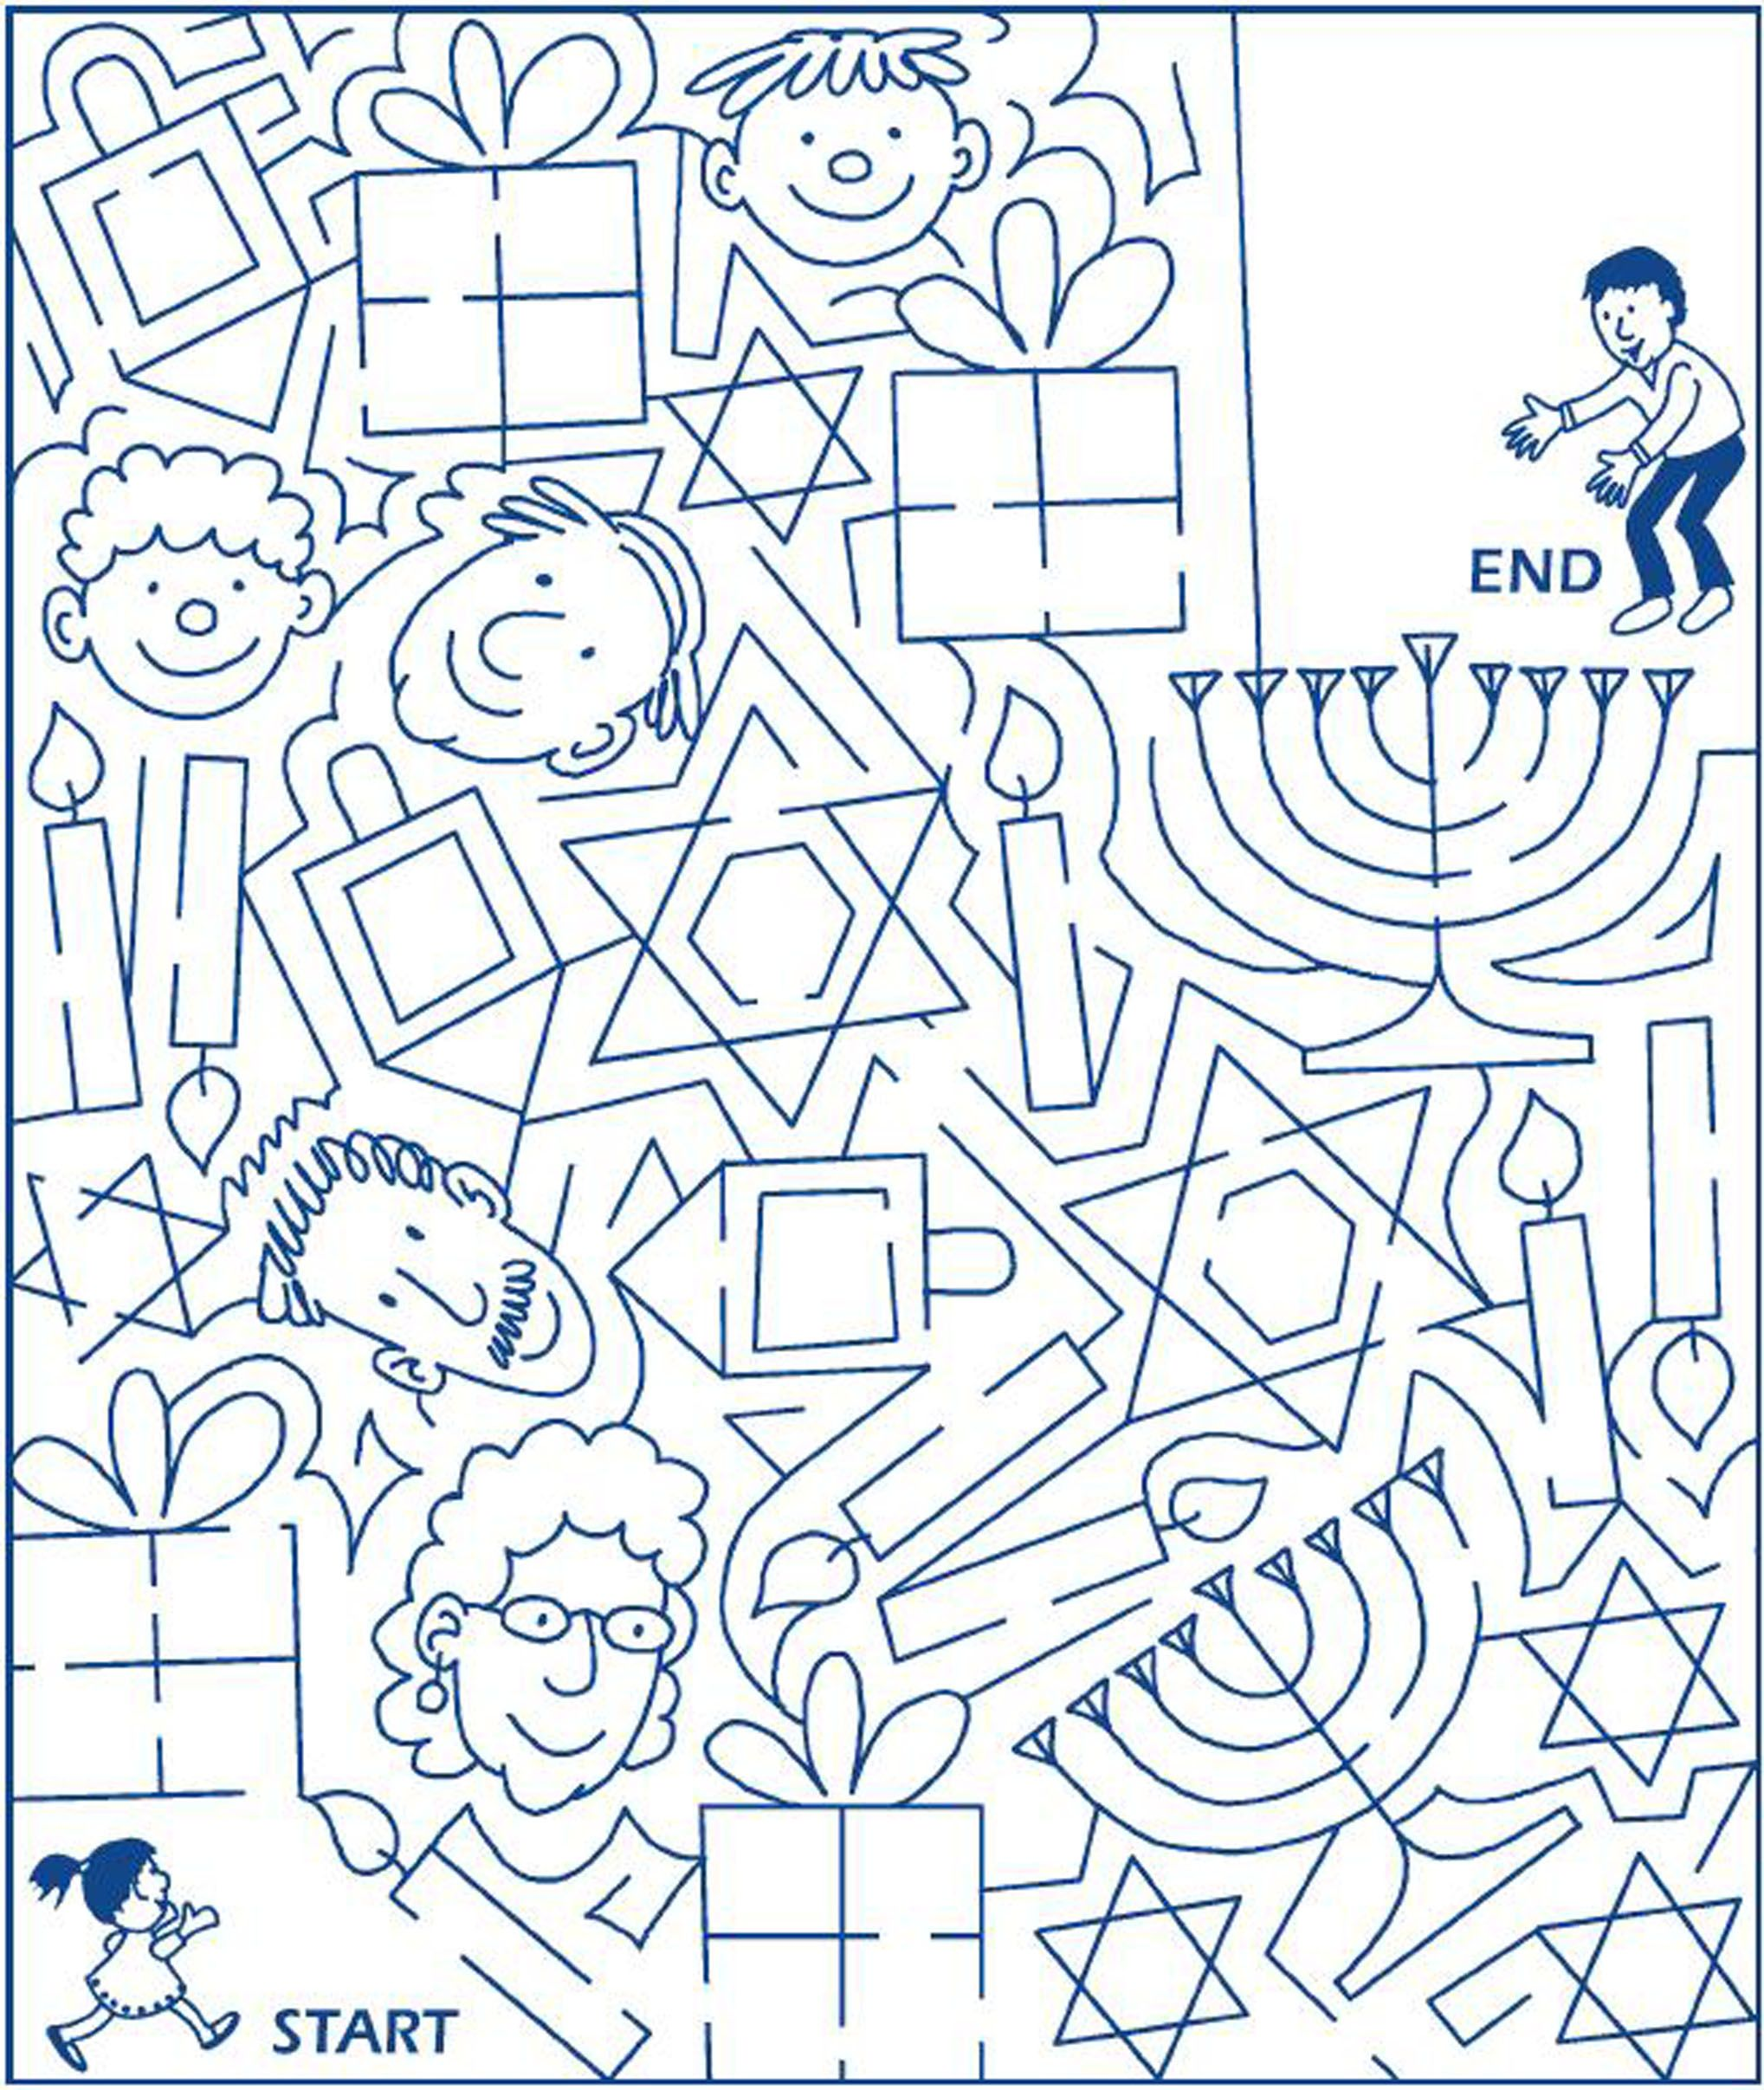 Hanukkah Activities For Preschoolers Quite A Crowd By Beth L Blair And Jennifer A Ericsson With Rabbi Hanukkah Crafts Hanukkah Traditions Hanukkah For Kids [ 2413 x 2037 Pixel ]